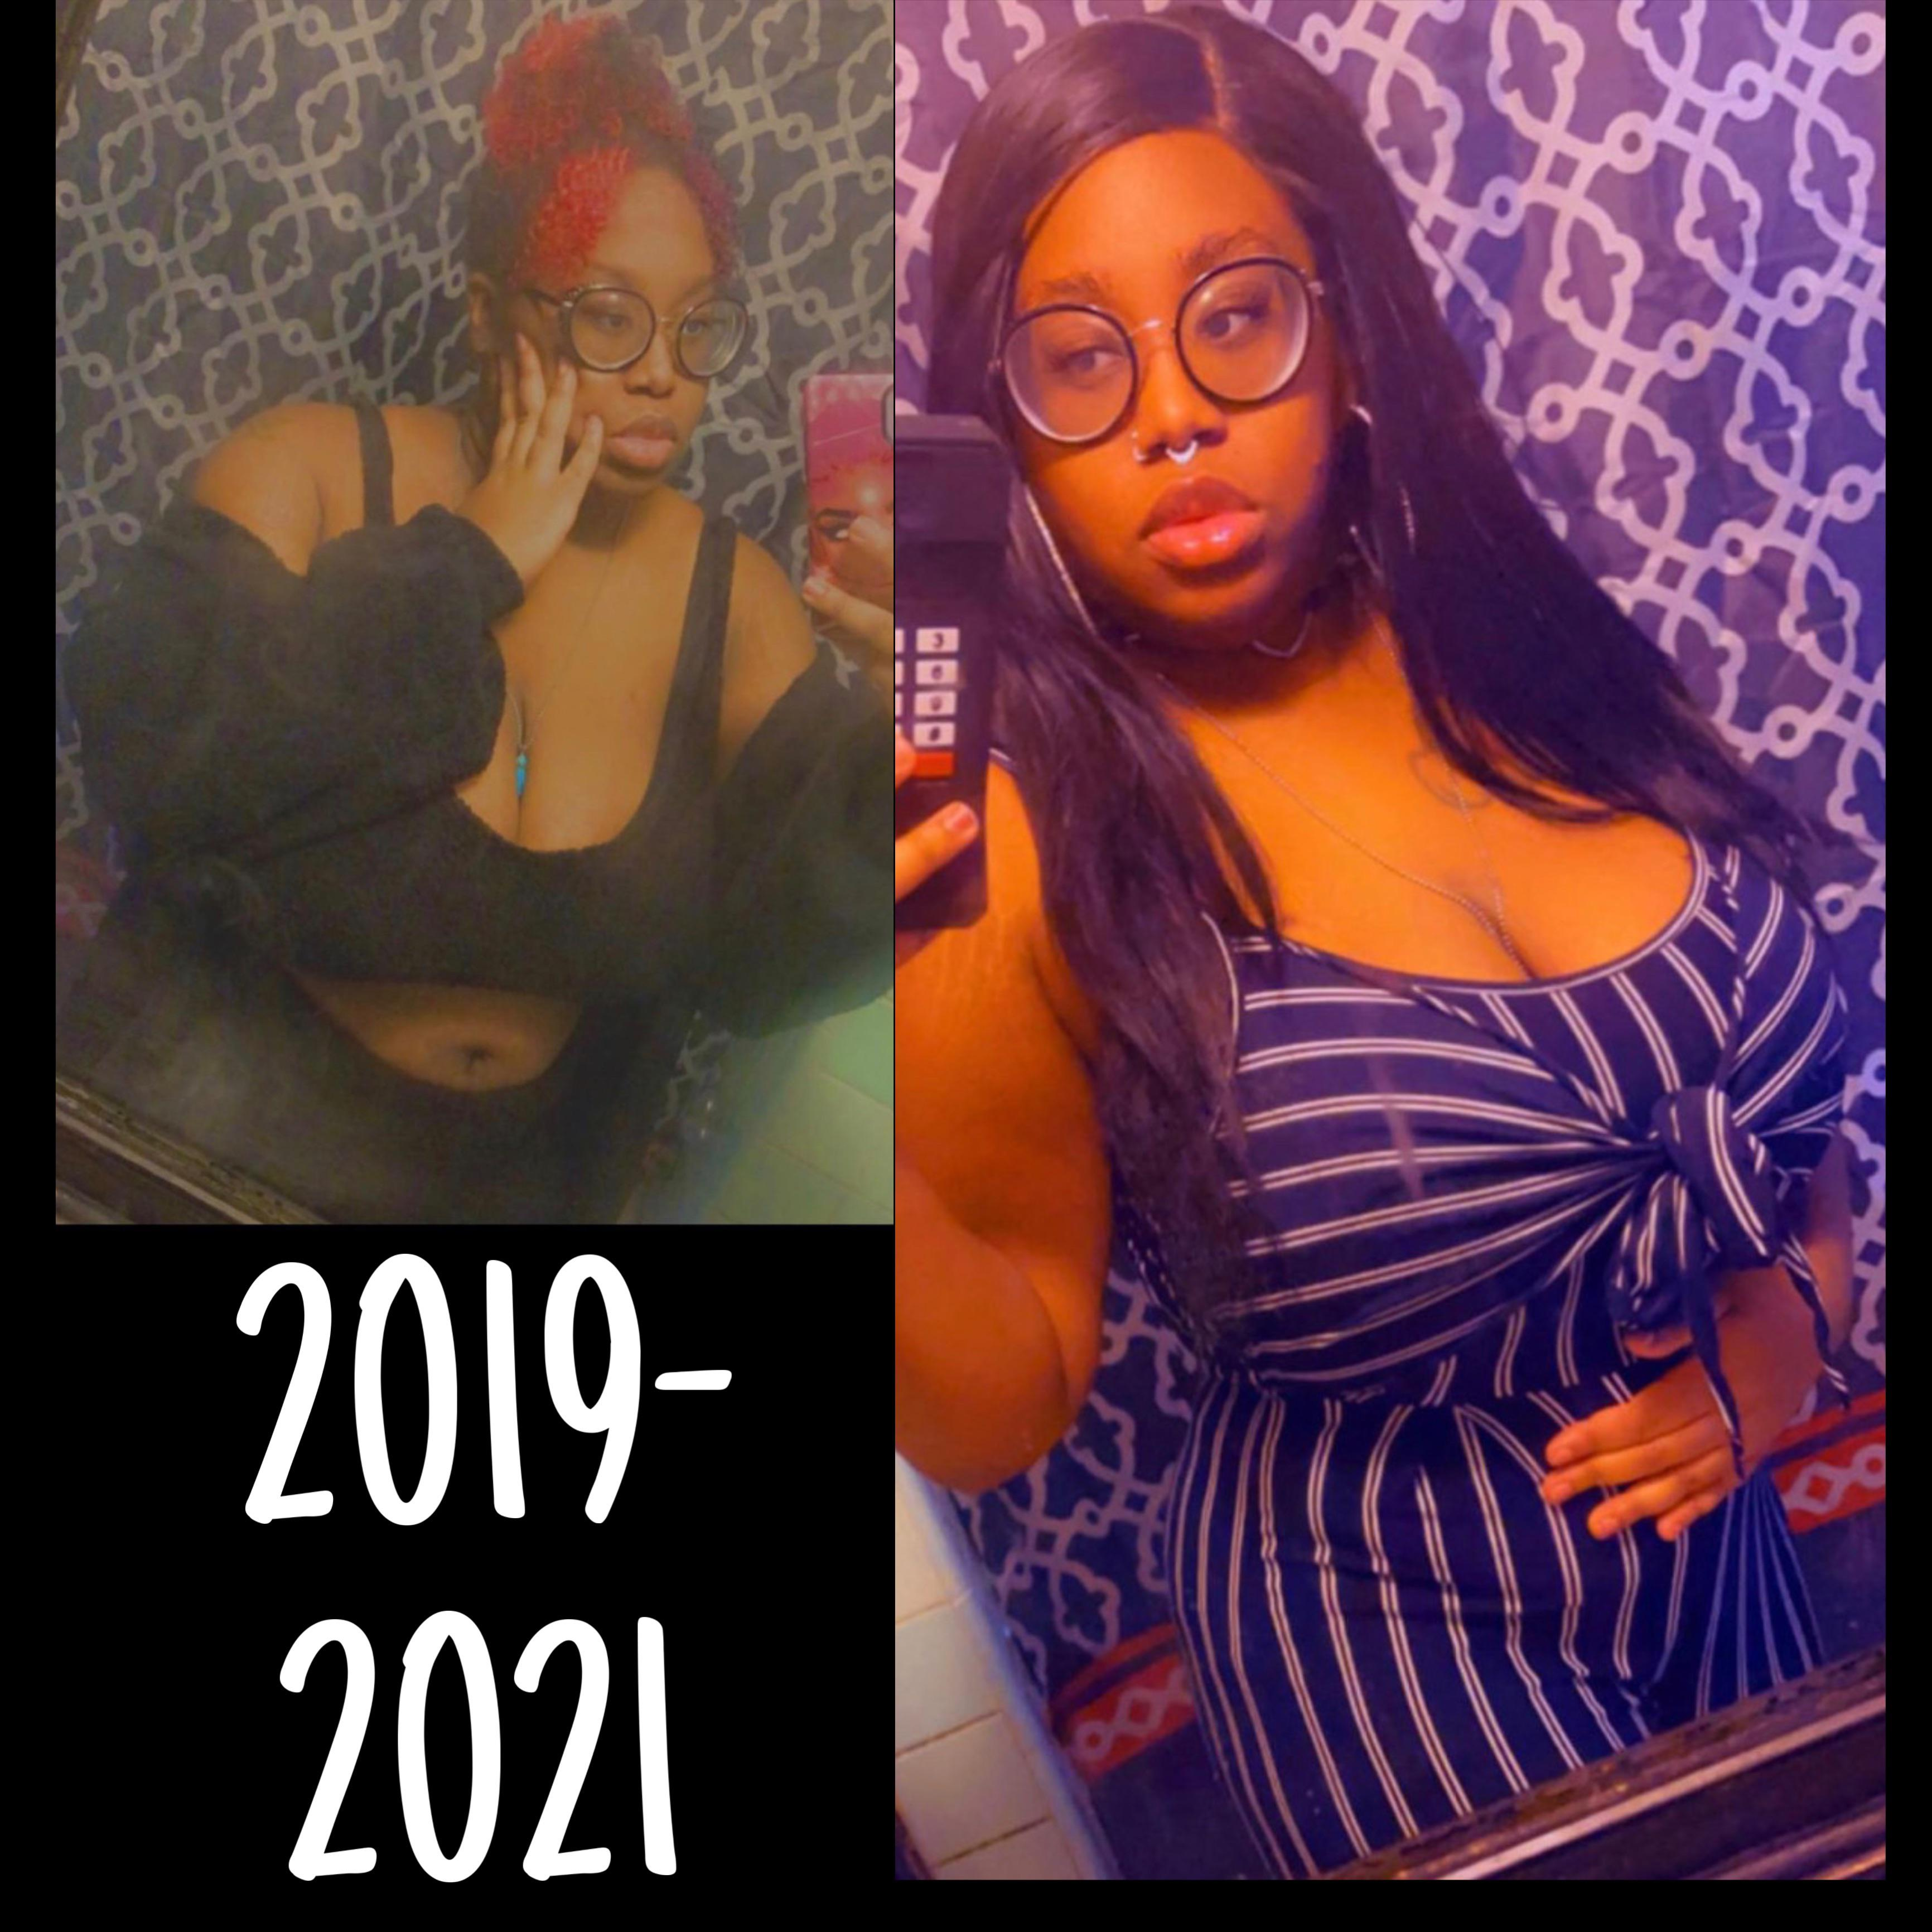 5'7 Female Progress Pics of 60 lbs Weight Loss 230 lbs to 170 lbs